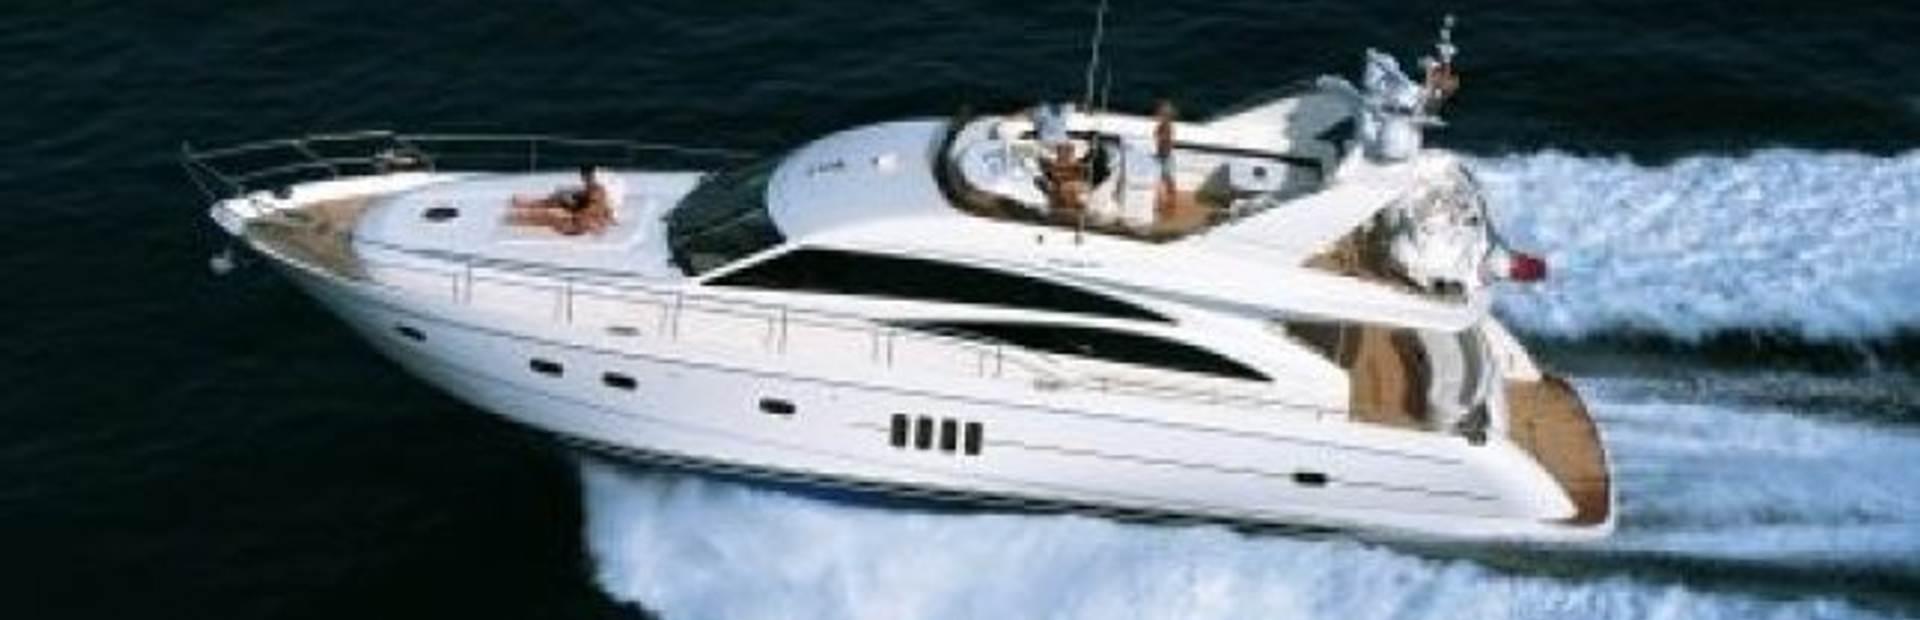 Princess 67 Yacht Charter